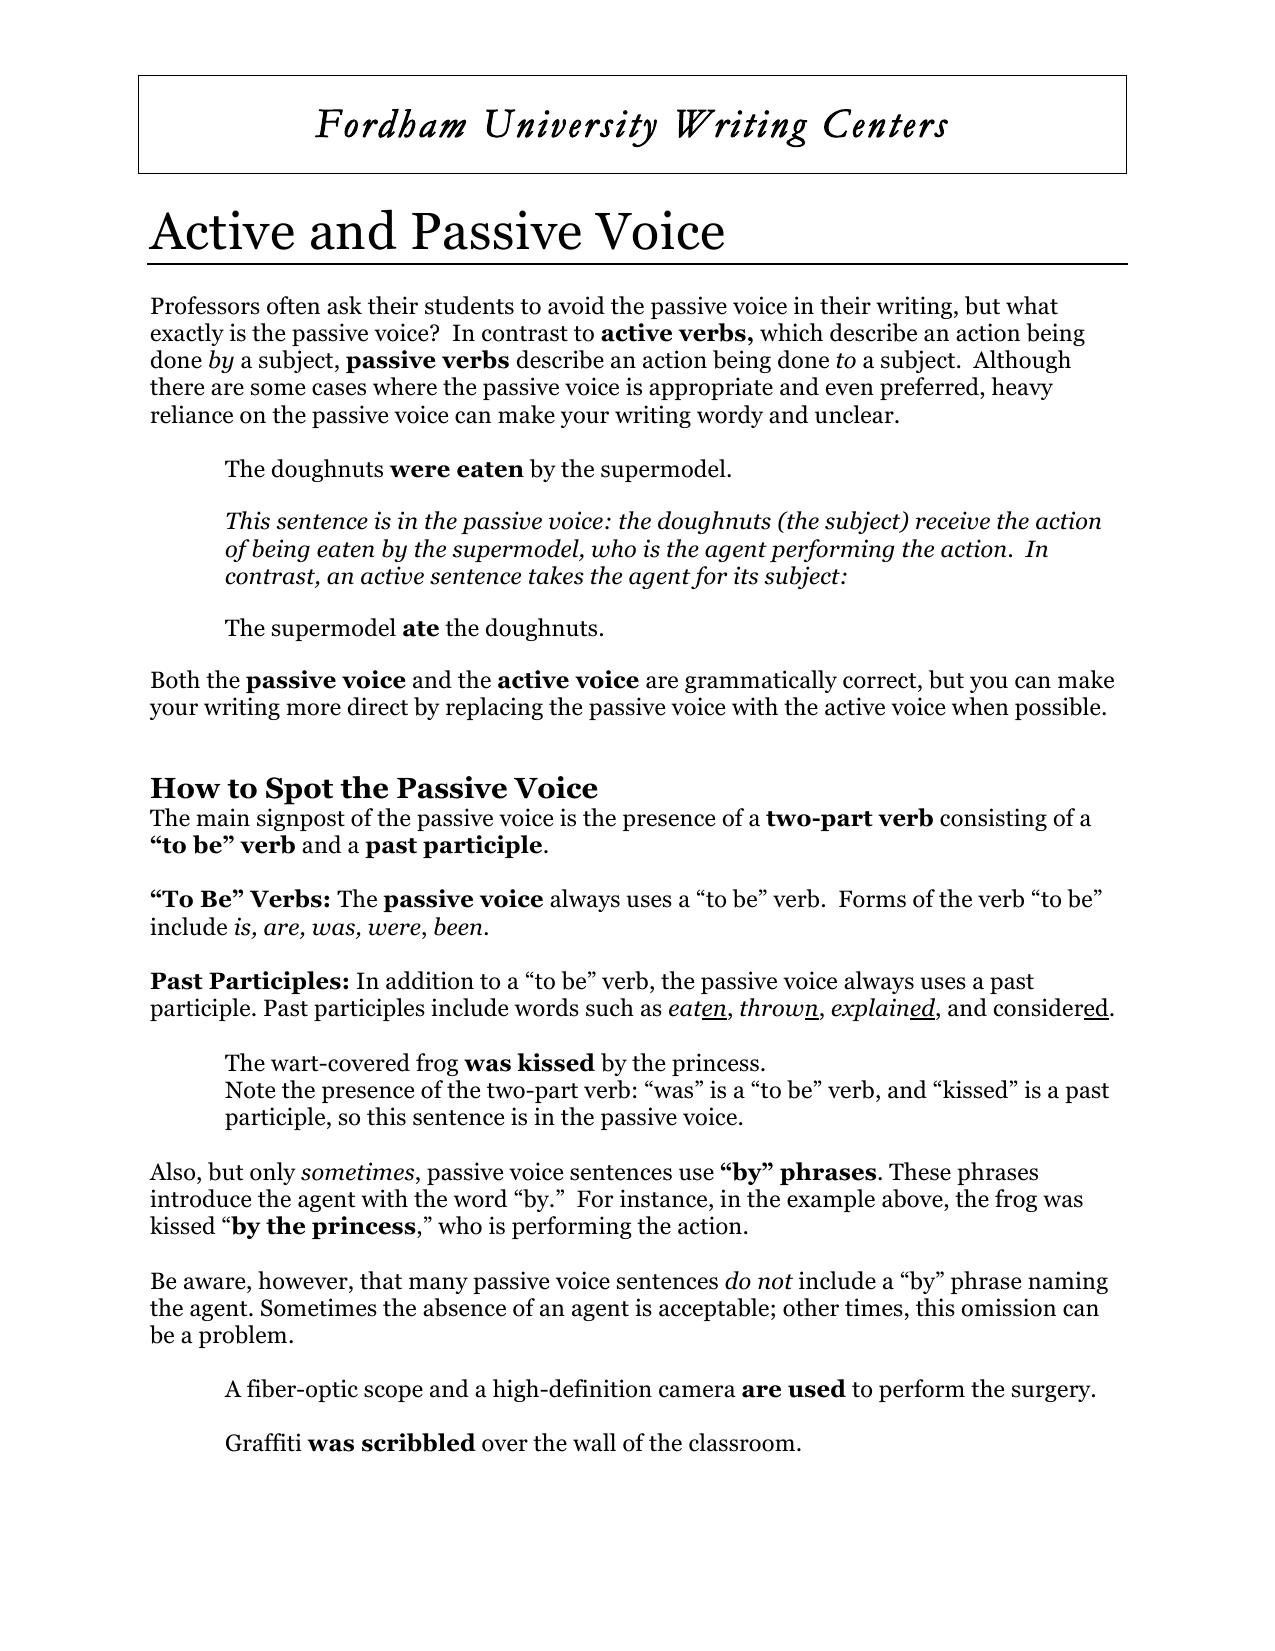 active voice words